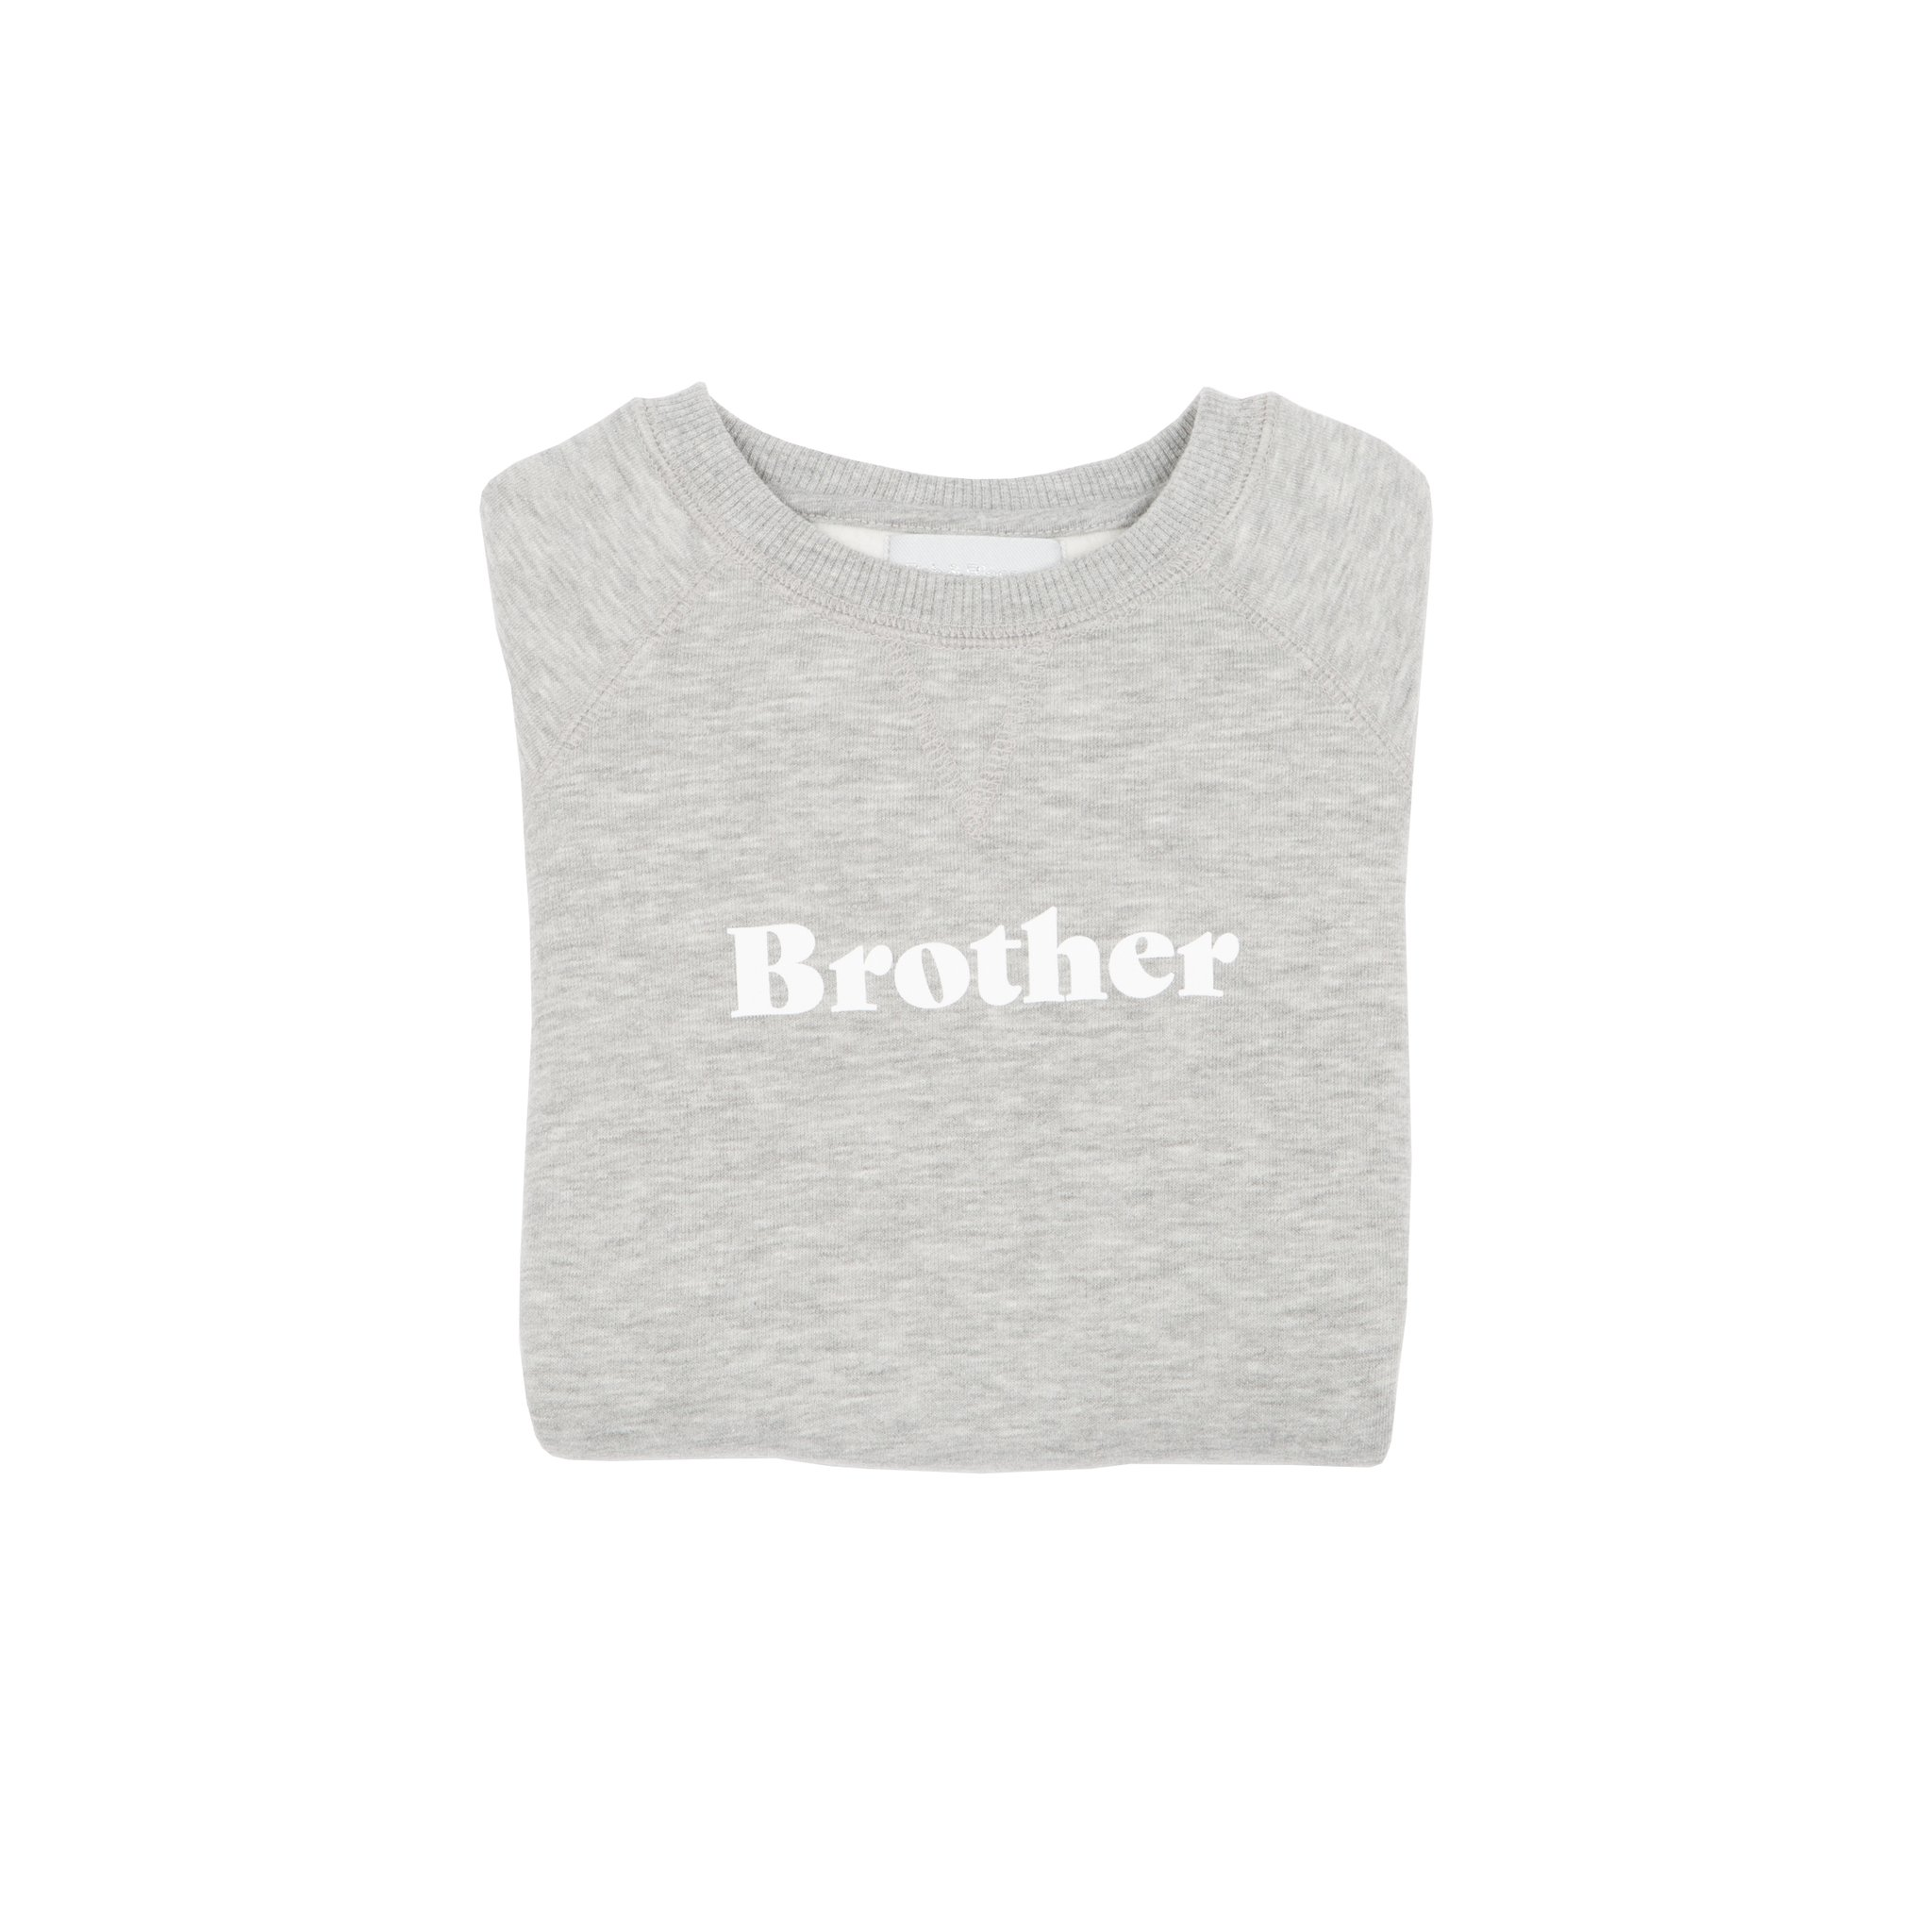 Bob & Blossom 'Brother' Sweatshirt - Grey Marl